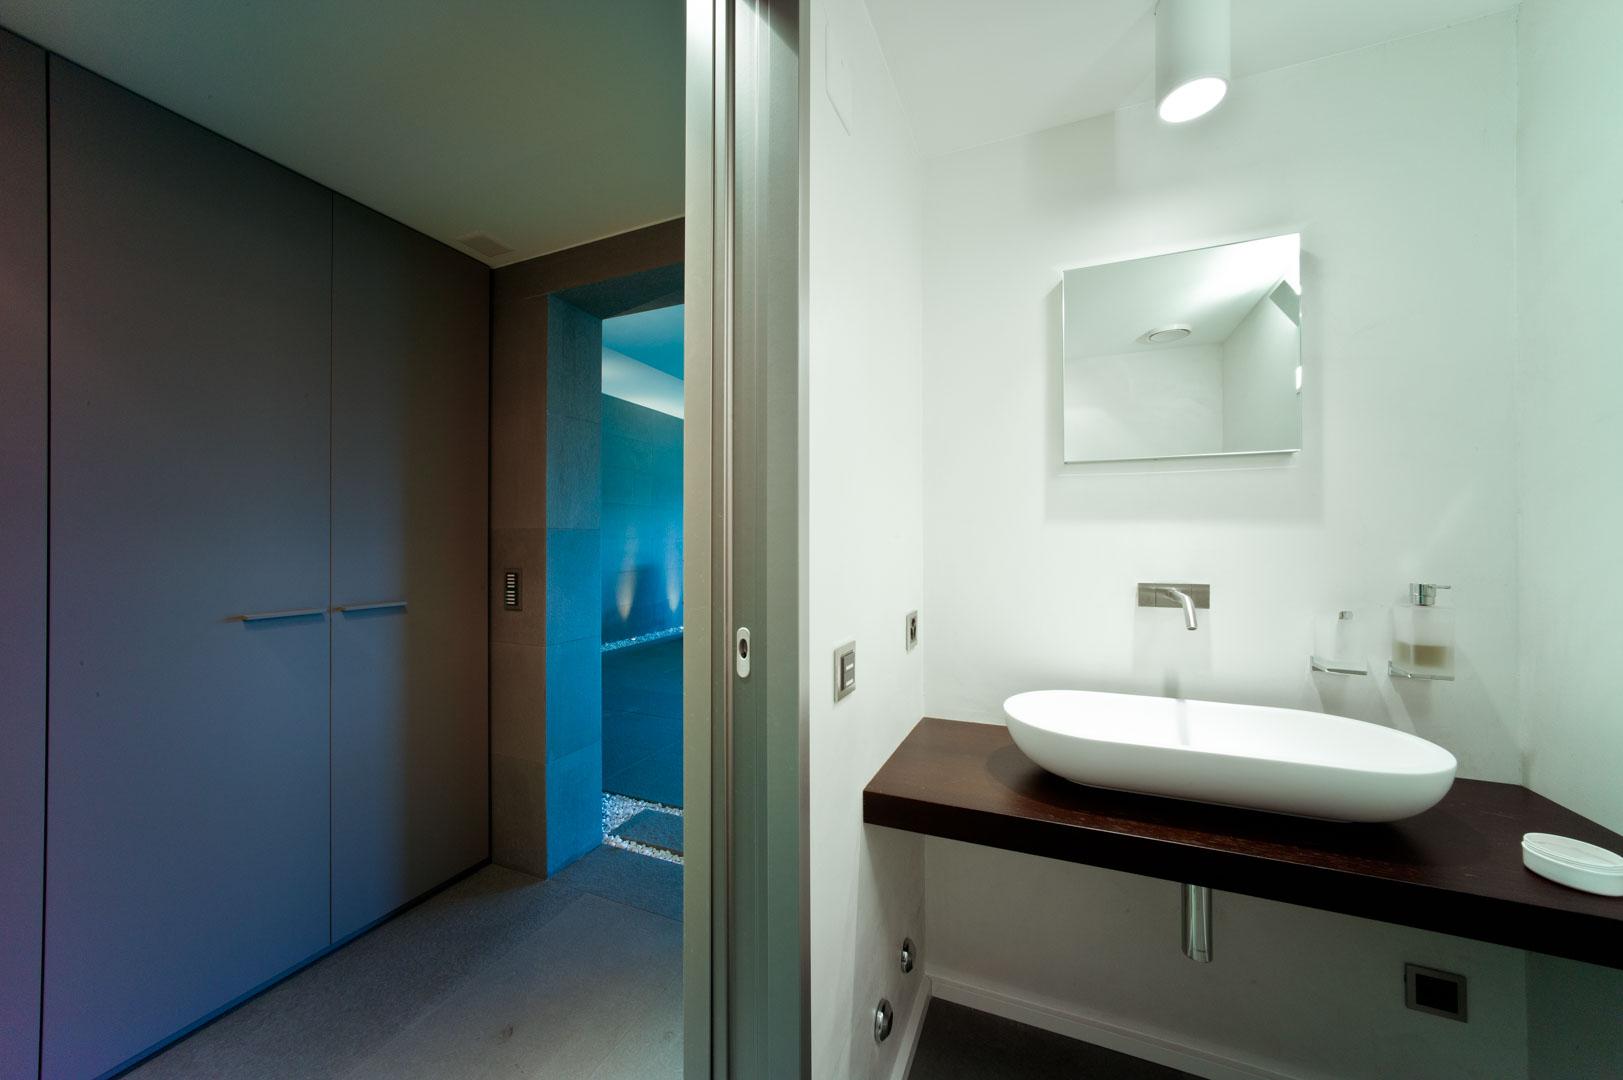 Fotografie d'Interni per Newline, arredamento e design